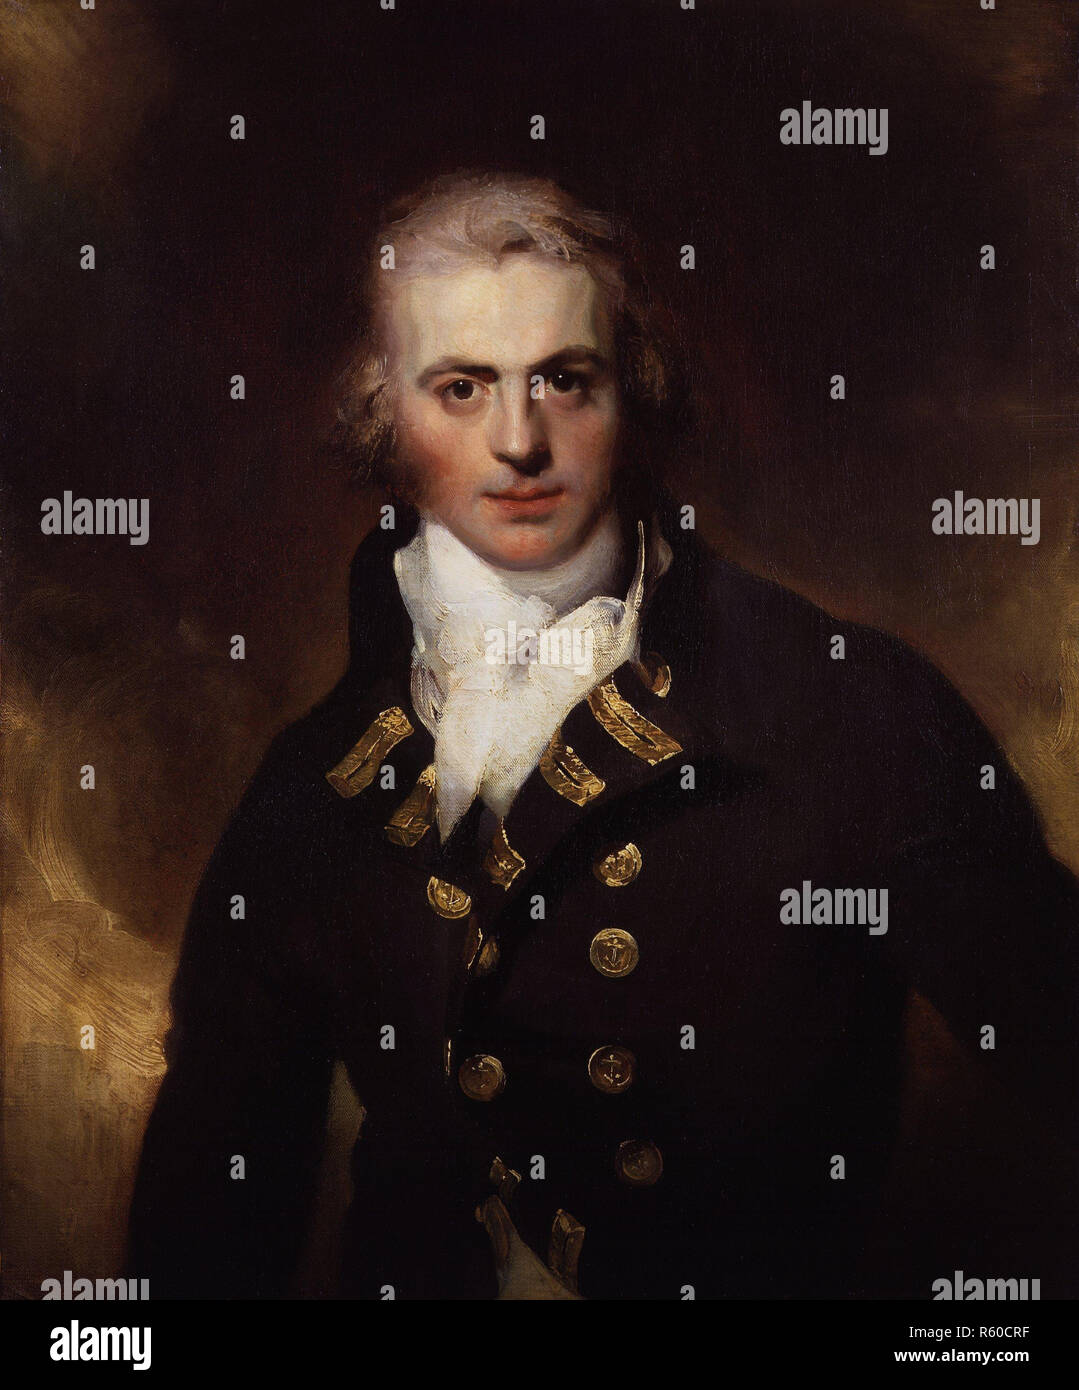 Sir Graham Moore by Sir Thomas Lawrence.jpg - R60CRF  - Stock Image